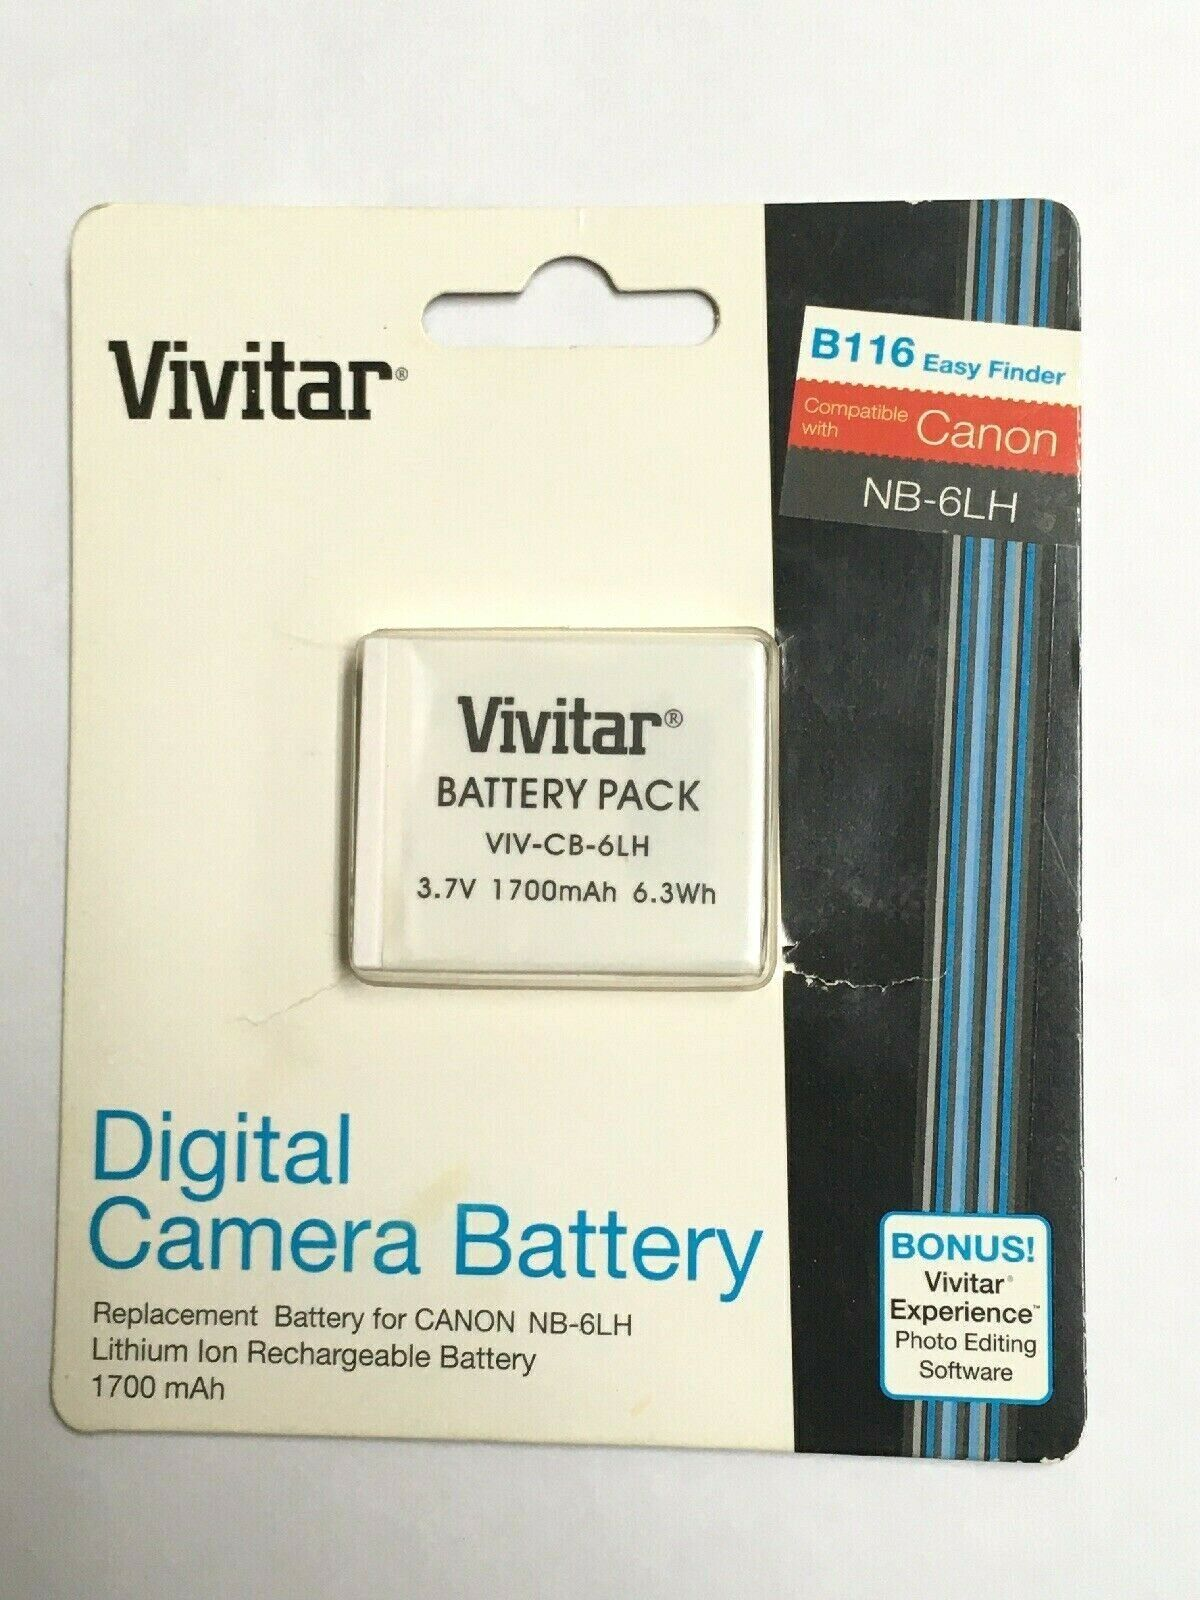 Vivitar NB-6L / NB-6LH Rechargeable Battery (Canon Replacement) 1700 mAH - $9.99